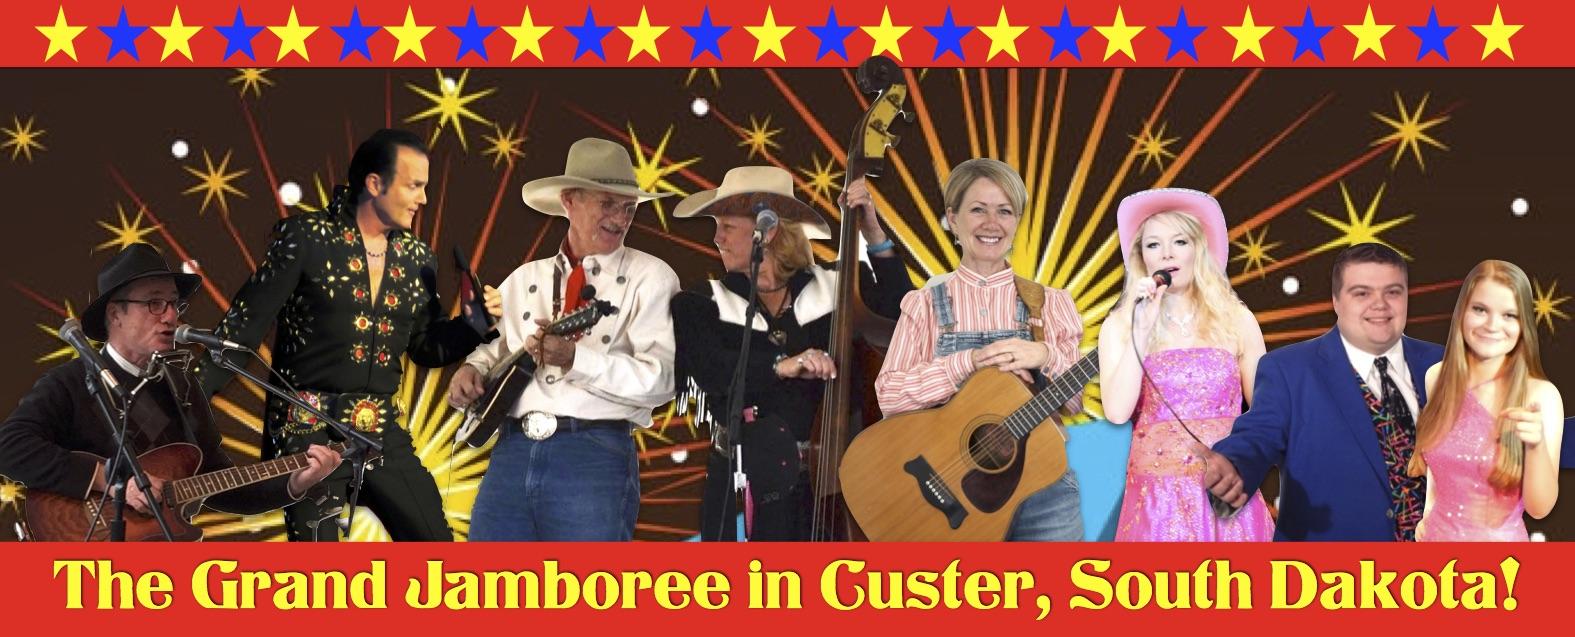 A musical variety show in Custer, South Dakota